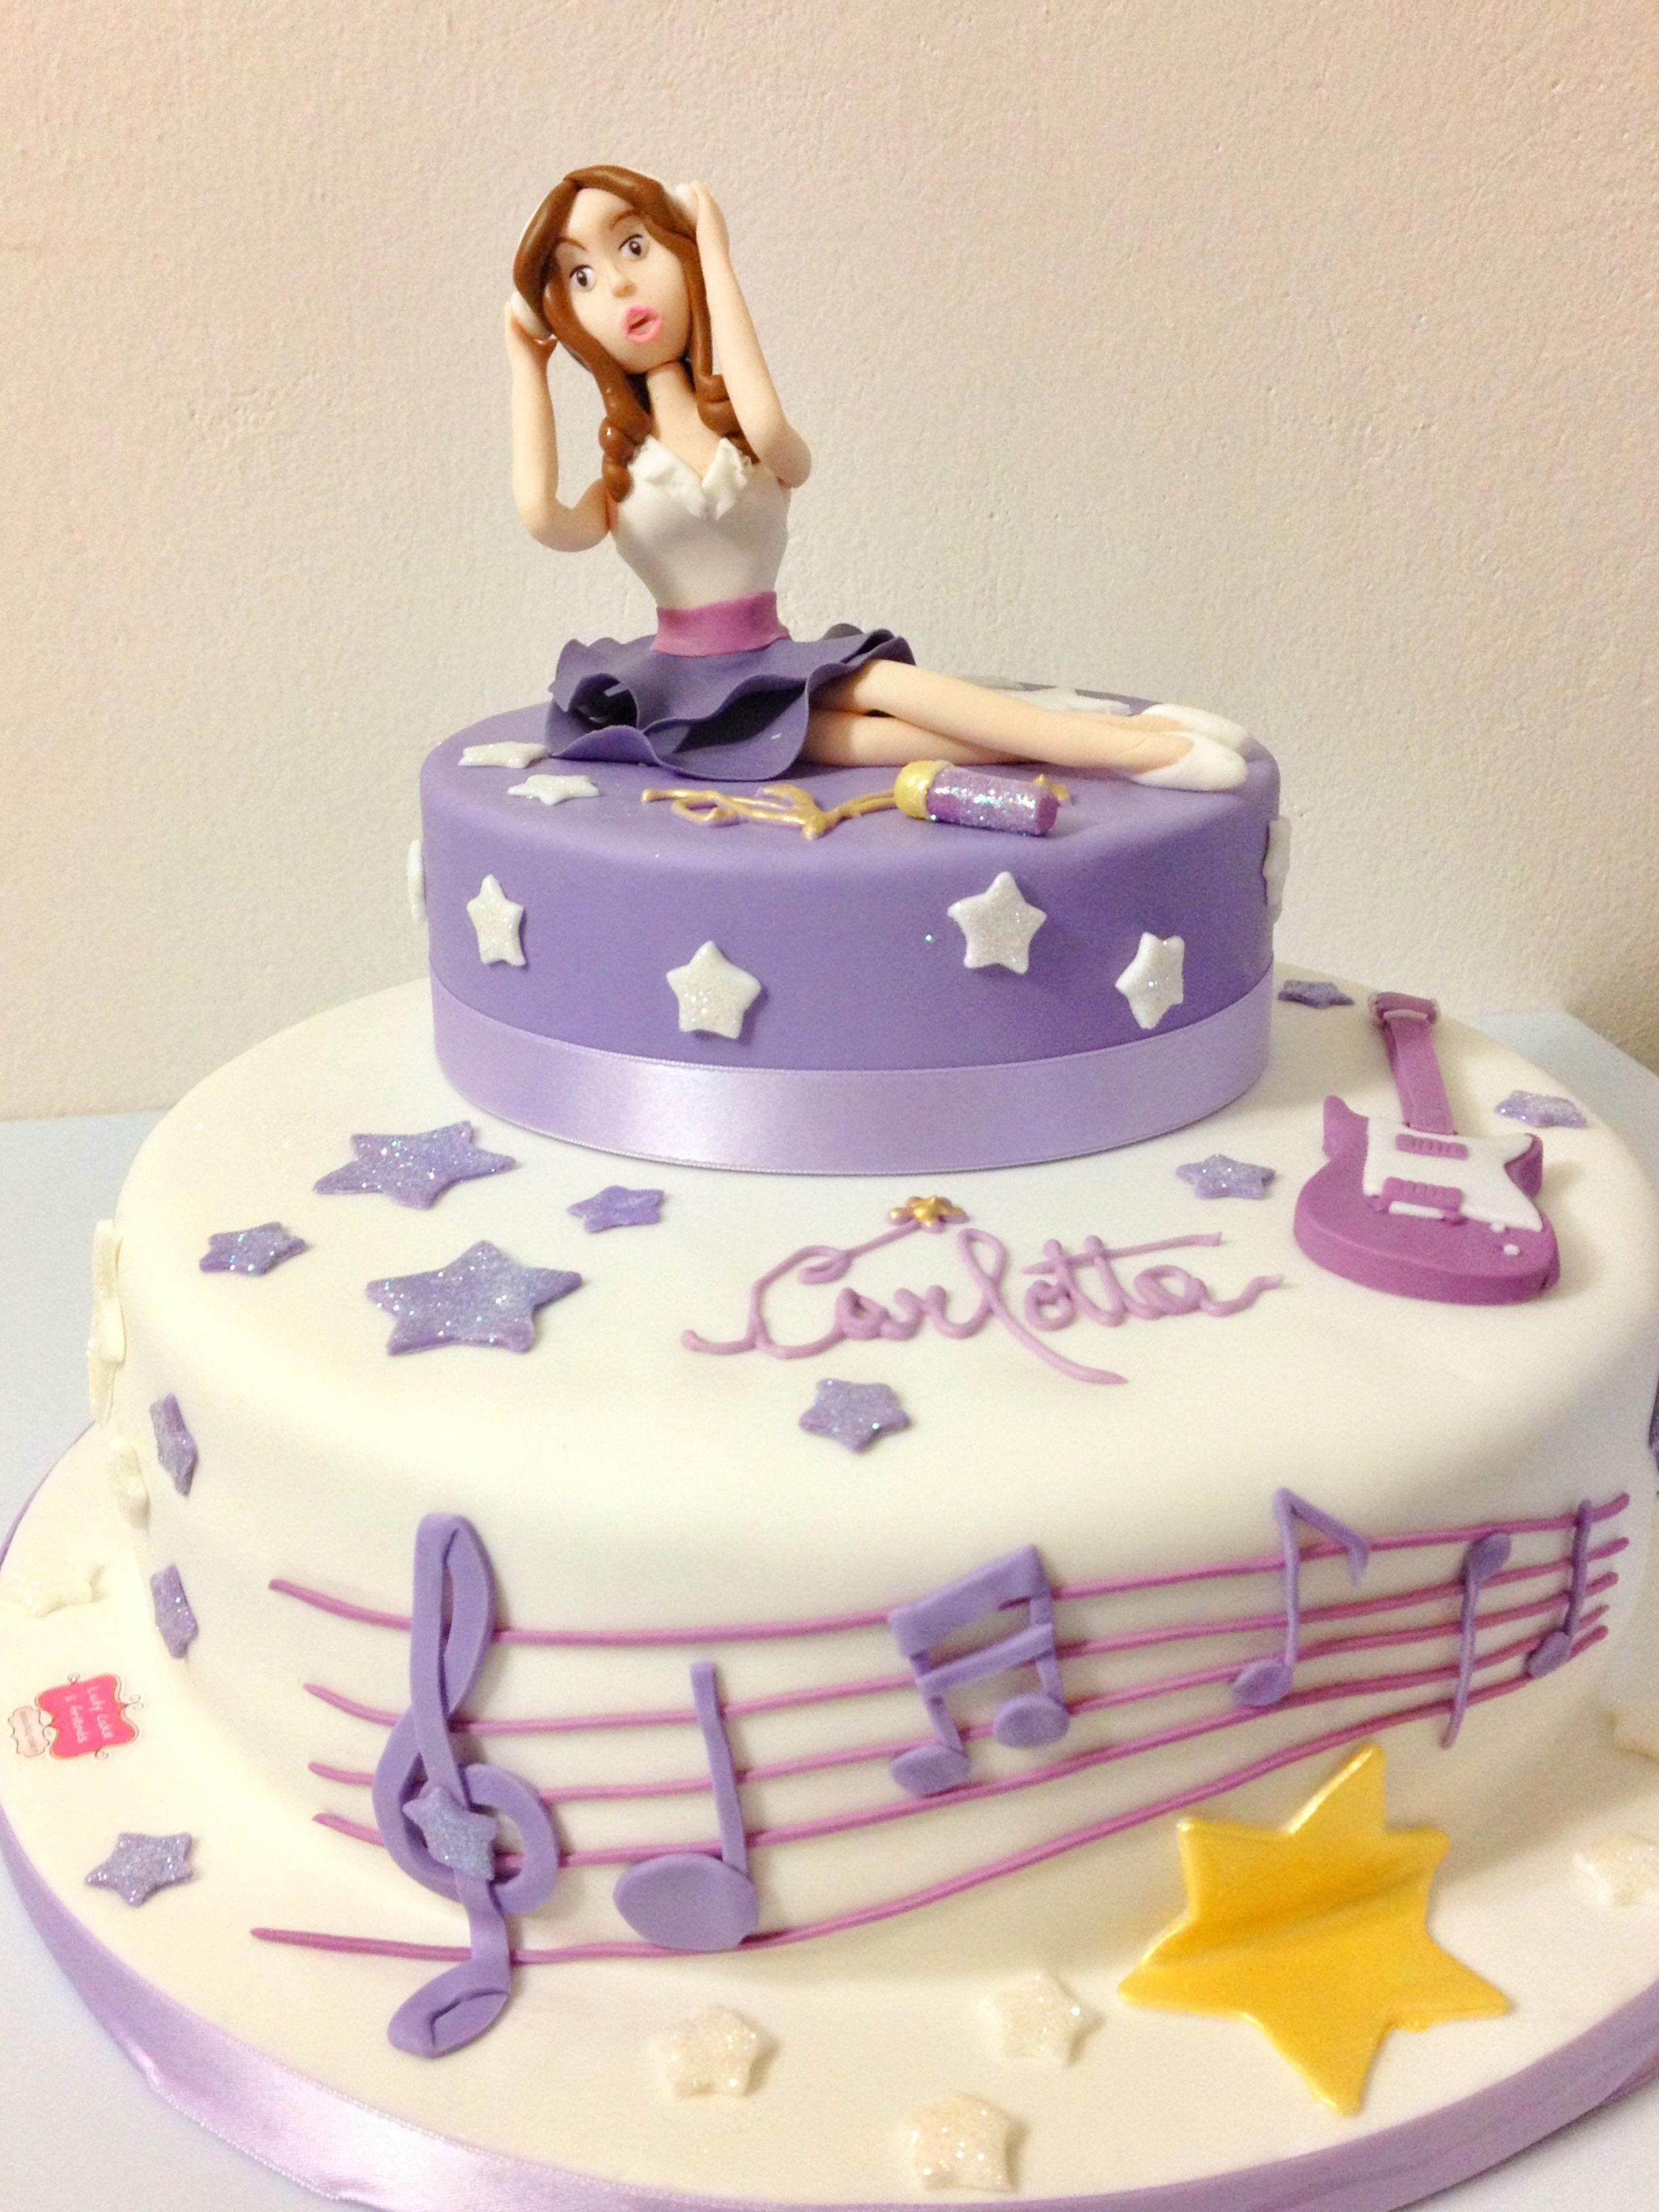 Cake Design Violetta : Violetta  cake Lady Cake design style Pinterest Cakes